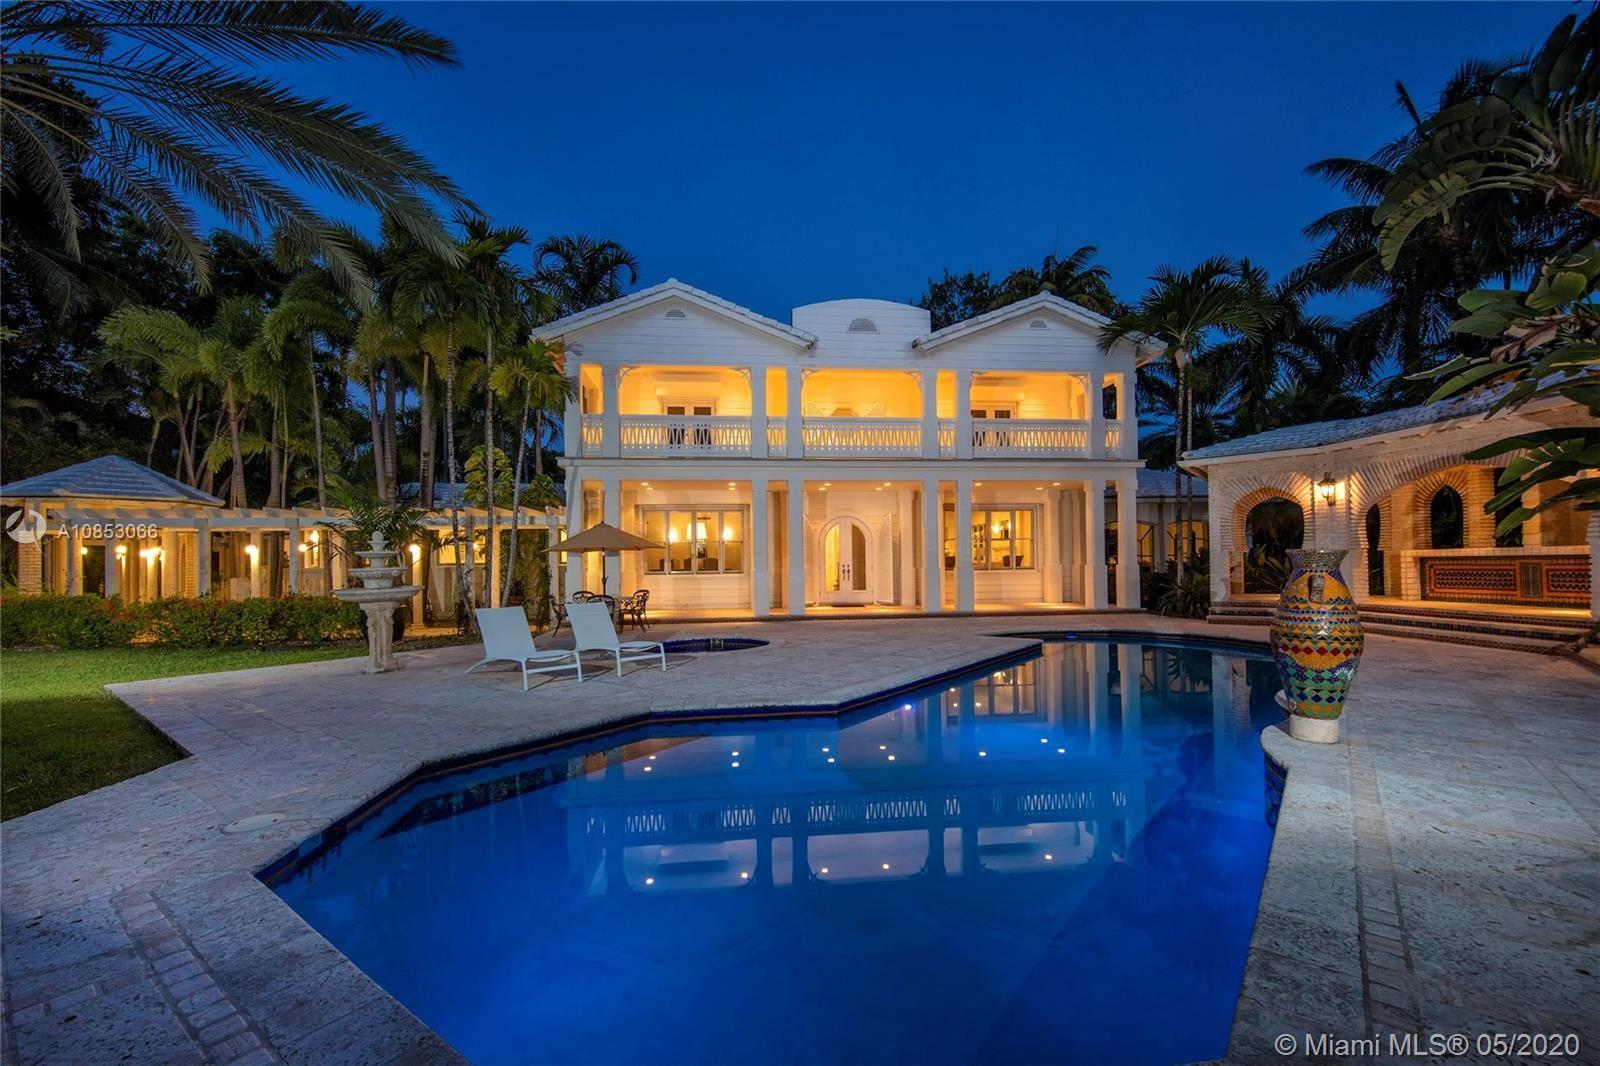 Photo 1 of Listing MLS a10853066 in 1 Star Island Dr Miami Beach FL 33139